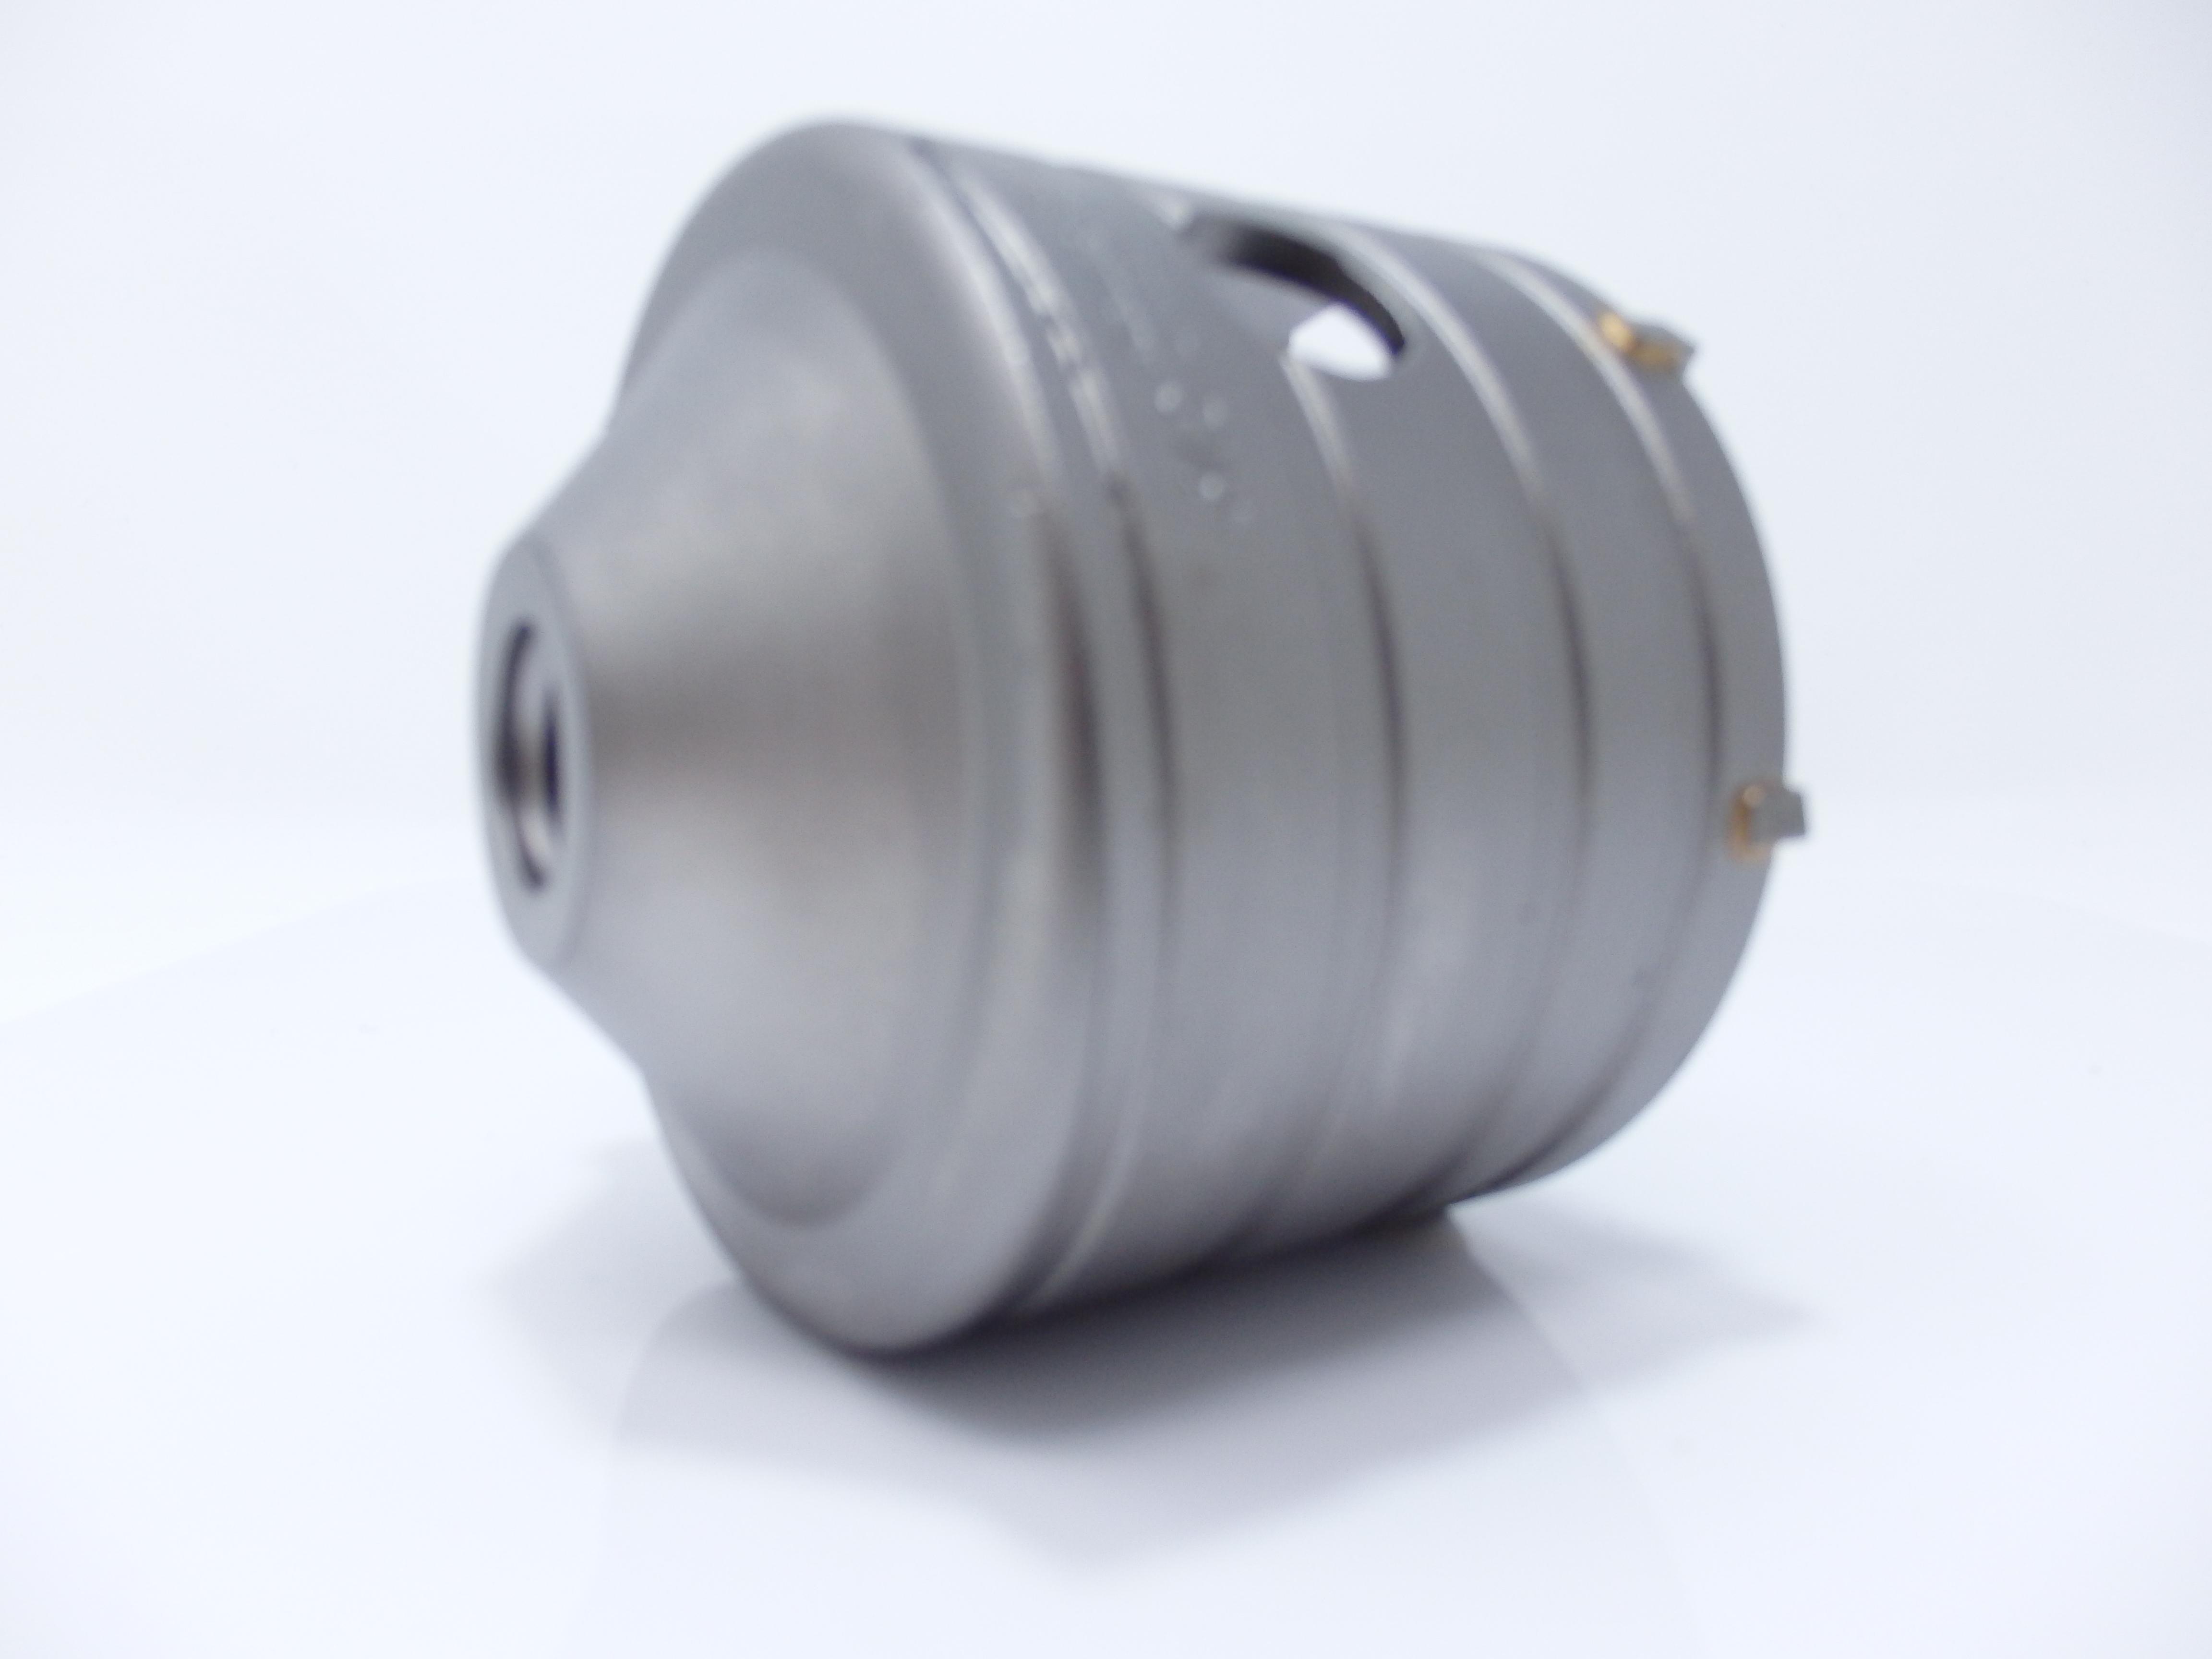 corona 80mm para agujerear hormig